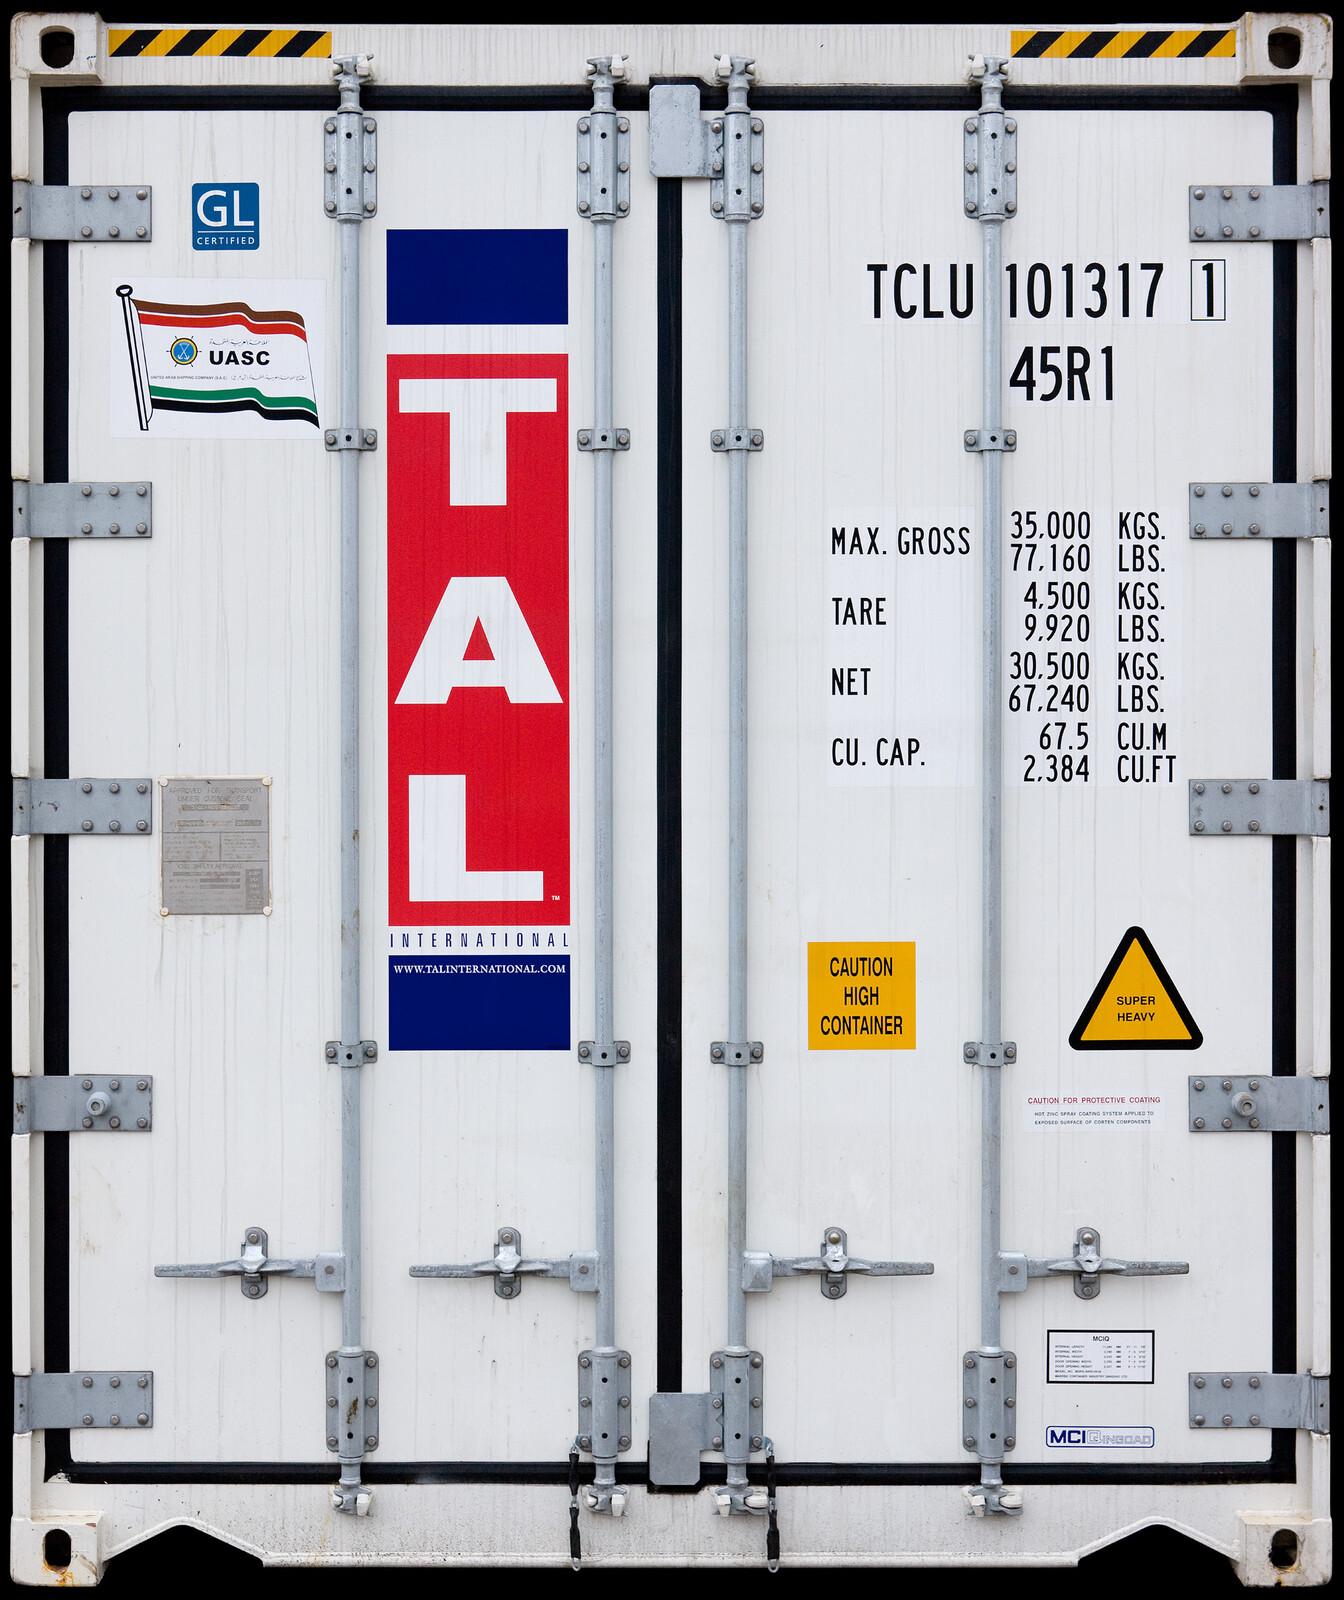 TCLU 1013171 - Thomas Eigel